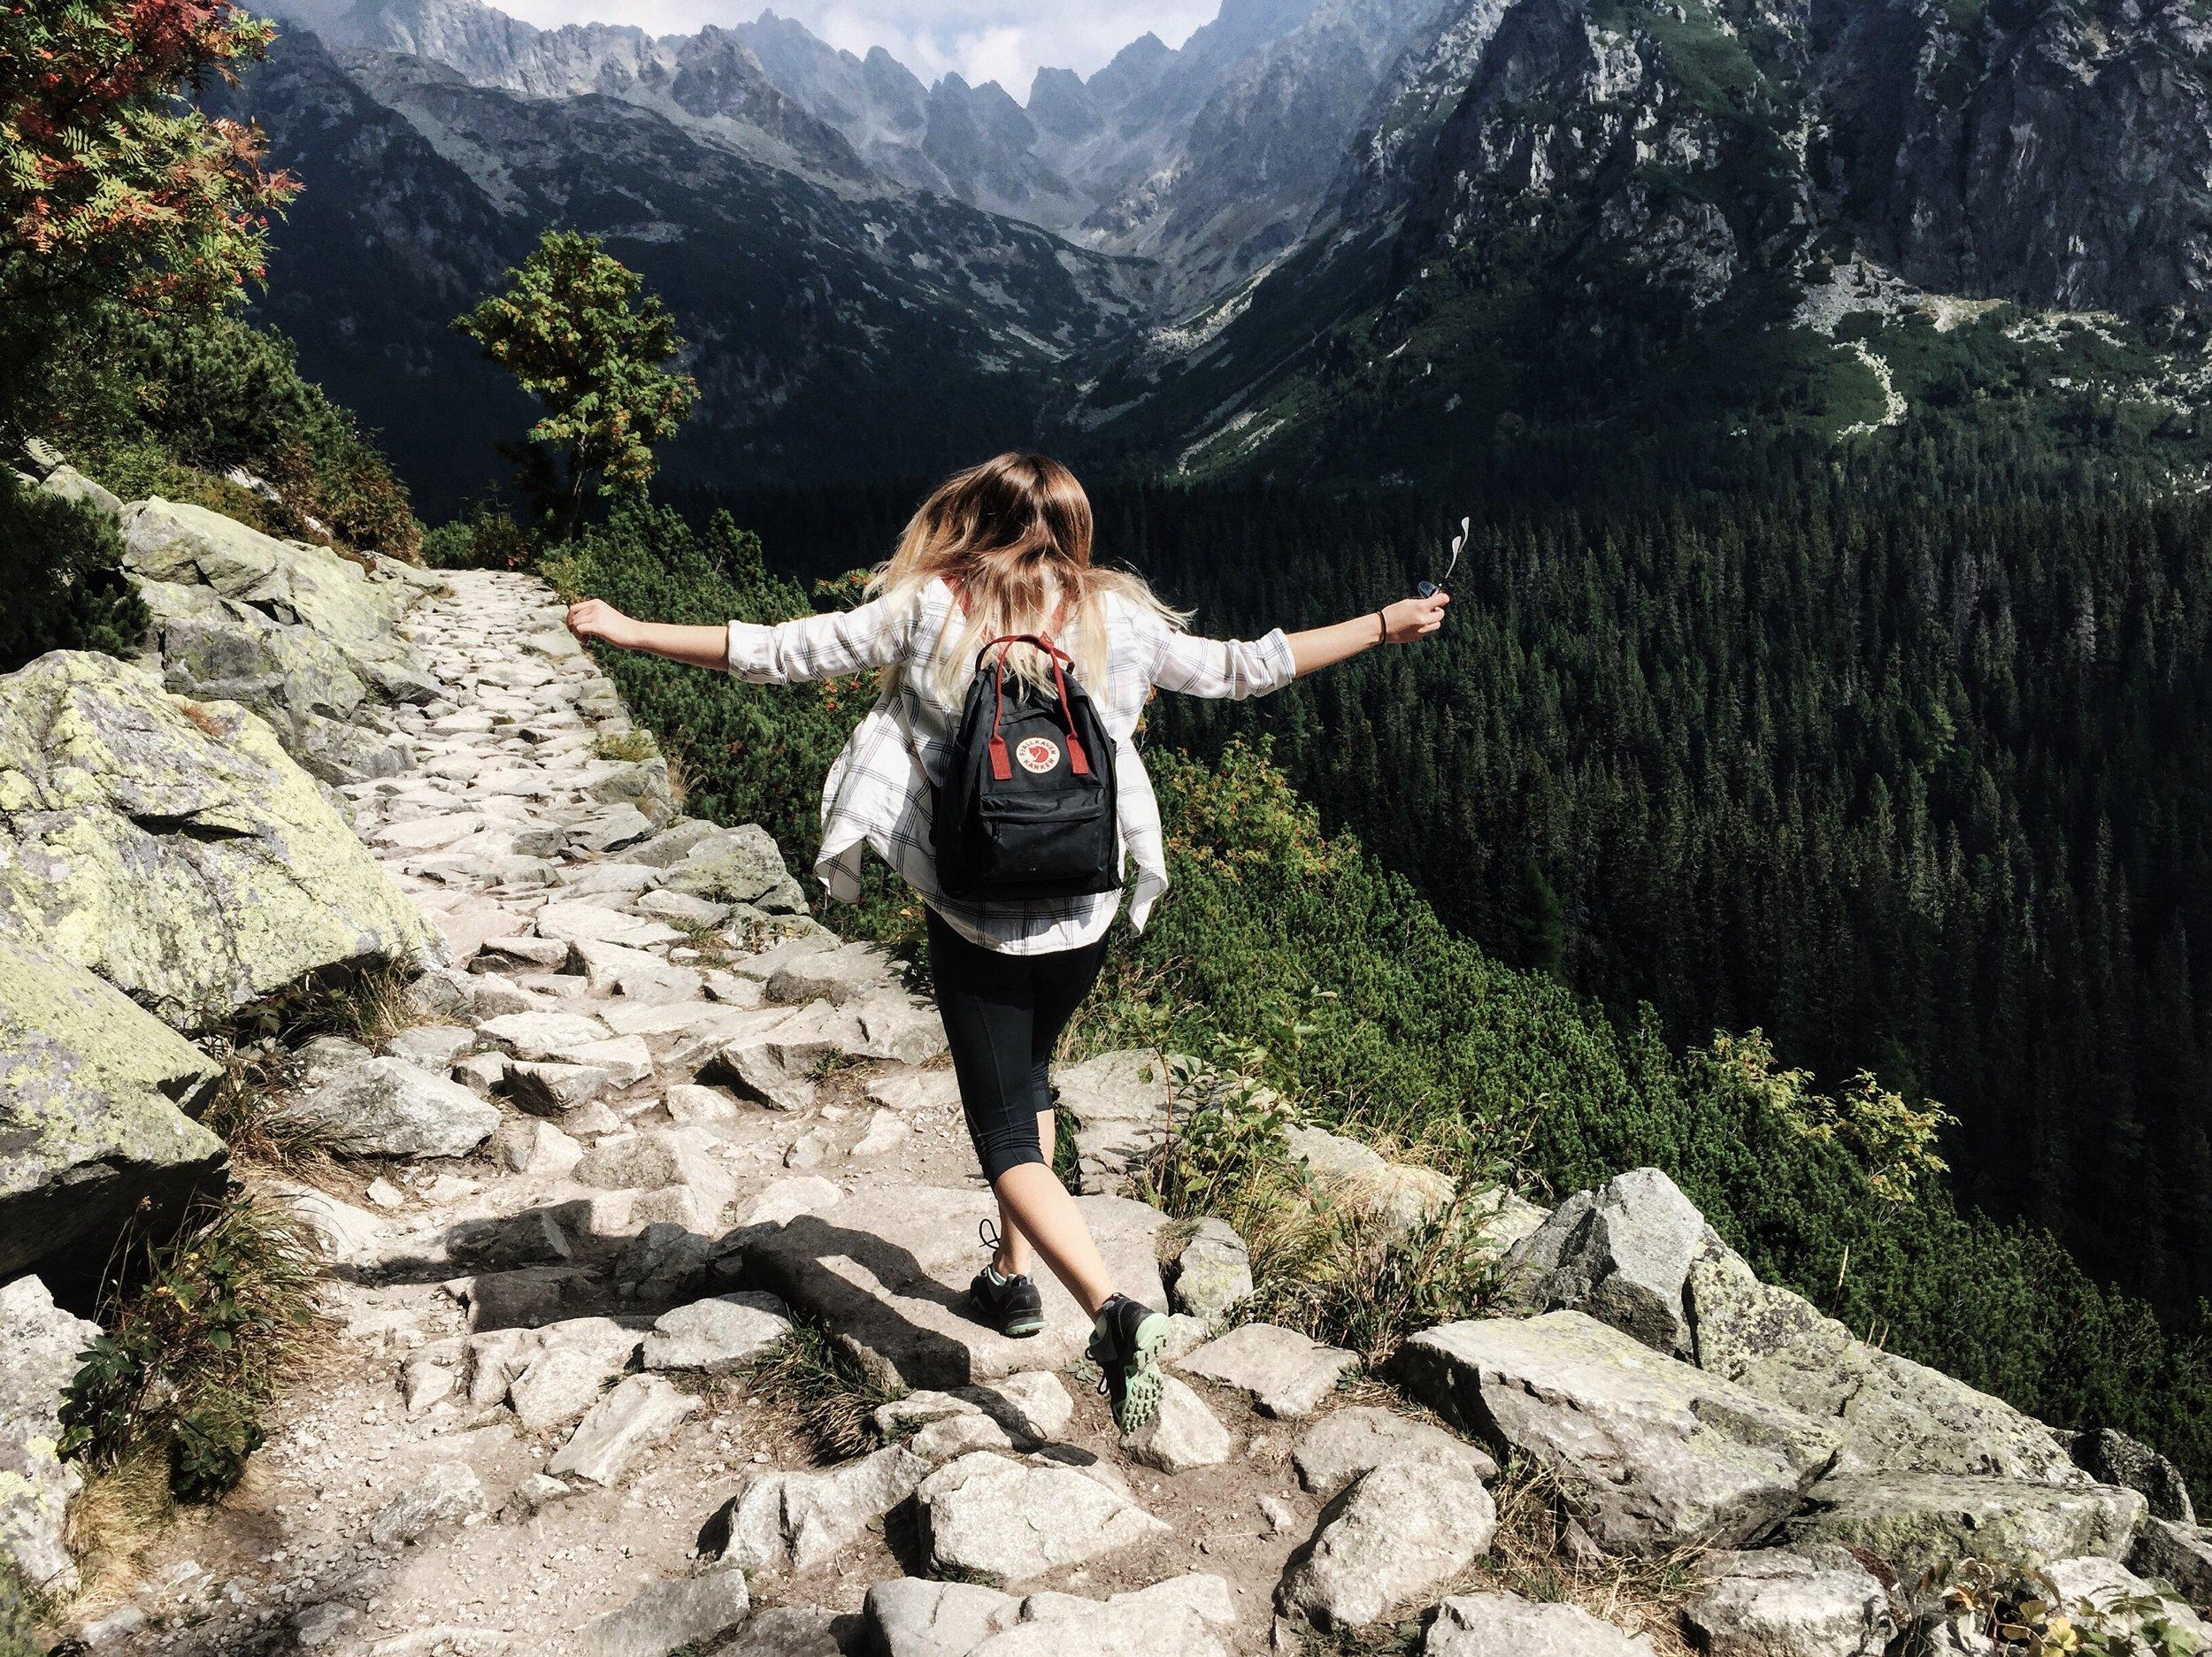 mountains girl pexels-photo-287240.jpeg